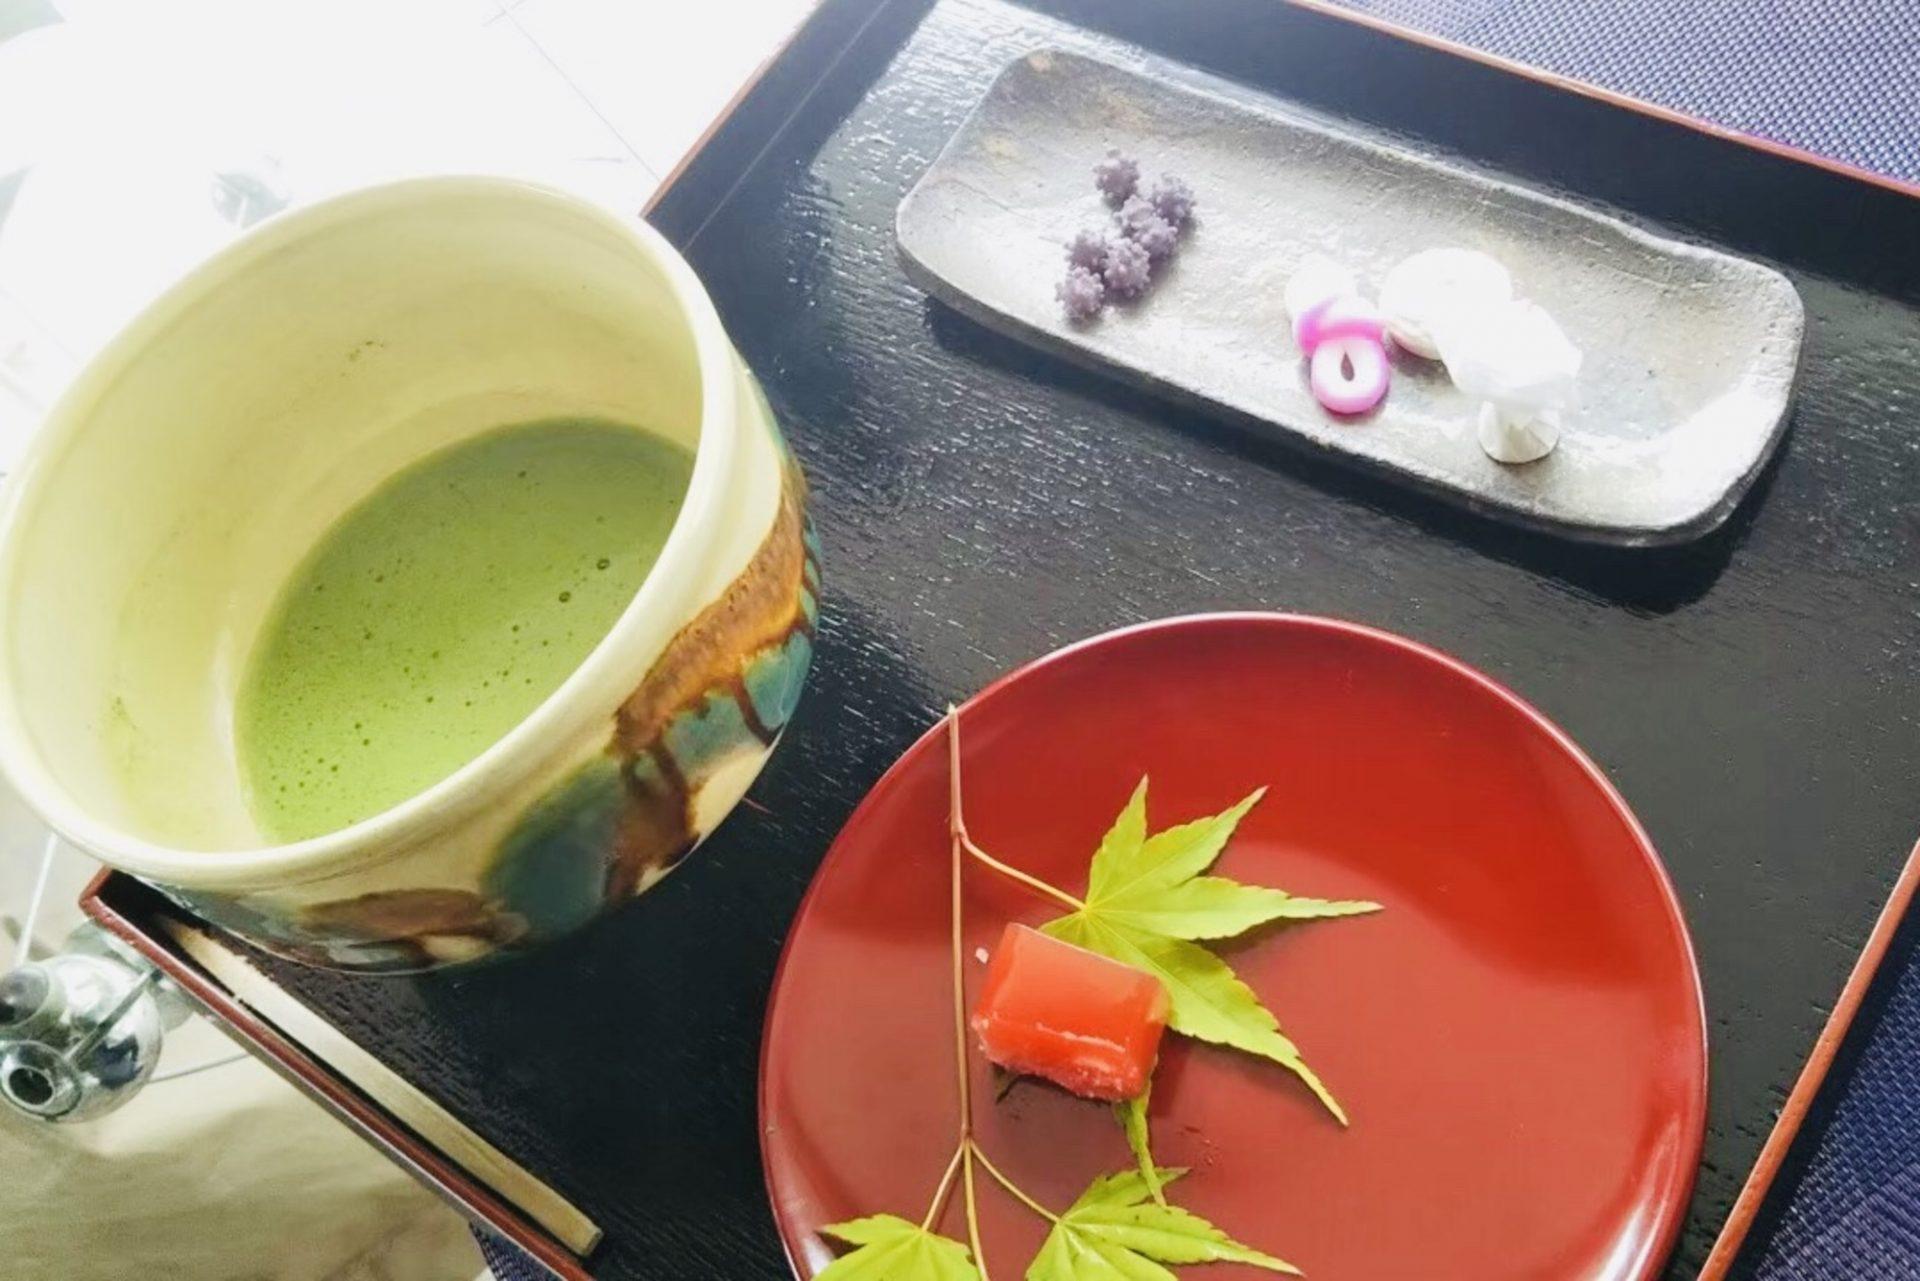 Kura-倉Cafe 熊本県 人吉市 球磨川くだり 九州 観光 旅行 レストラン